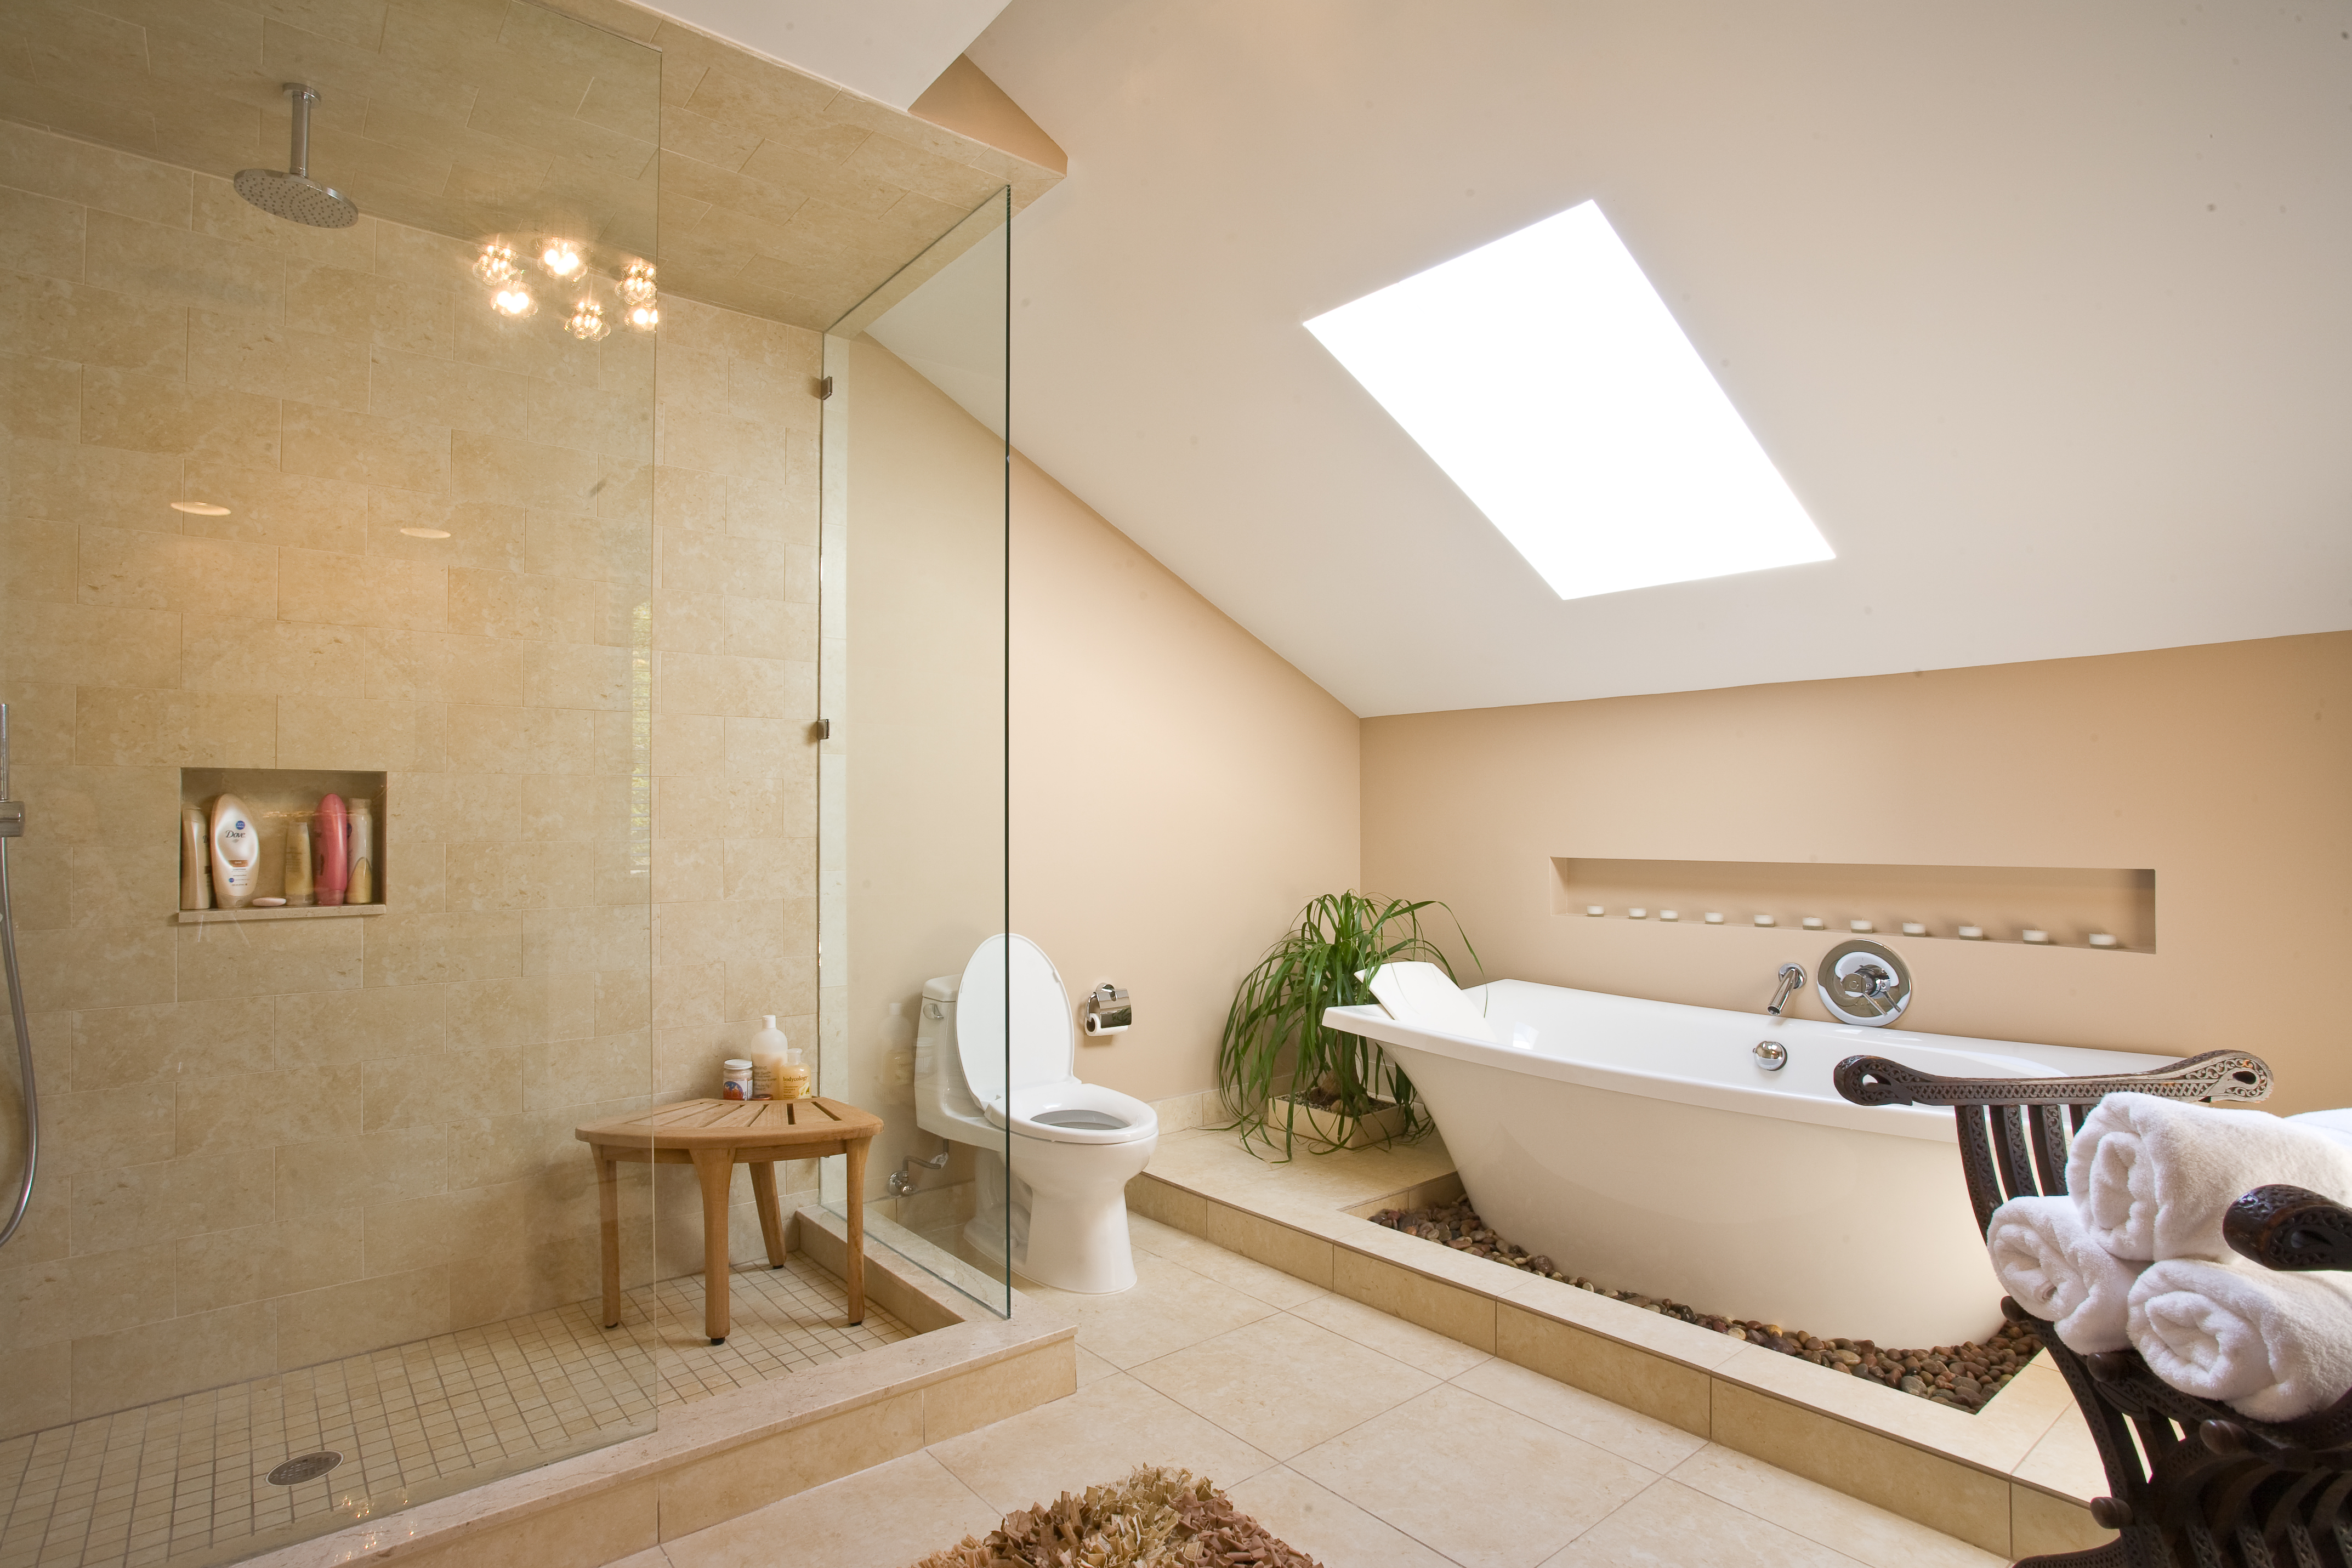 Warm Bathroom Design With Skylight Ceiling Large Shower Room Big Bath Tub  And Fur Rug